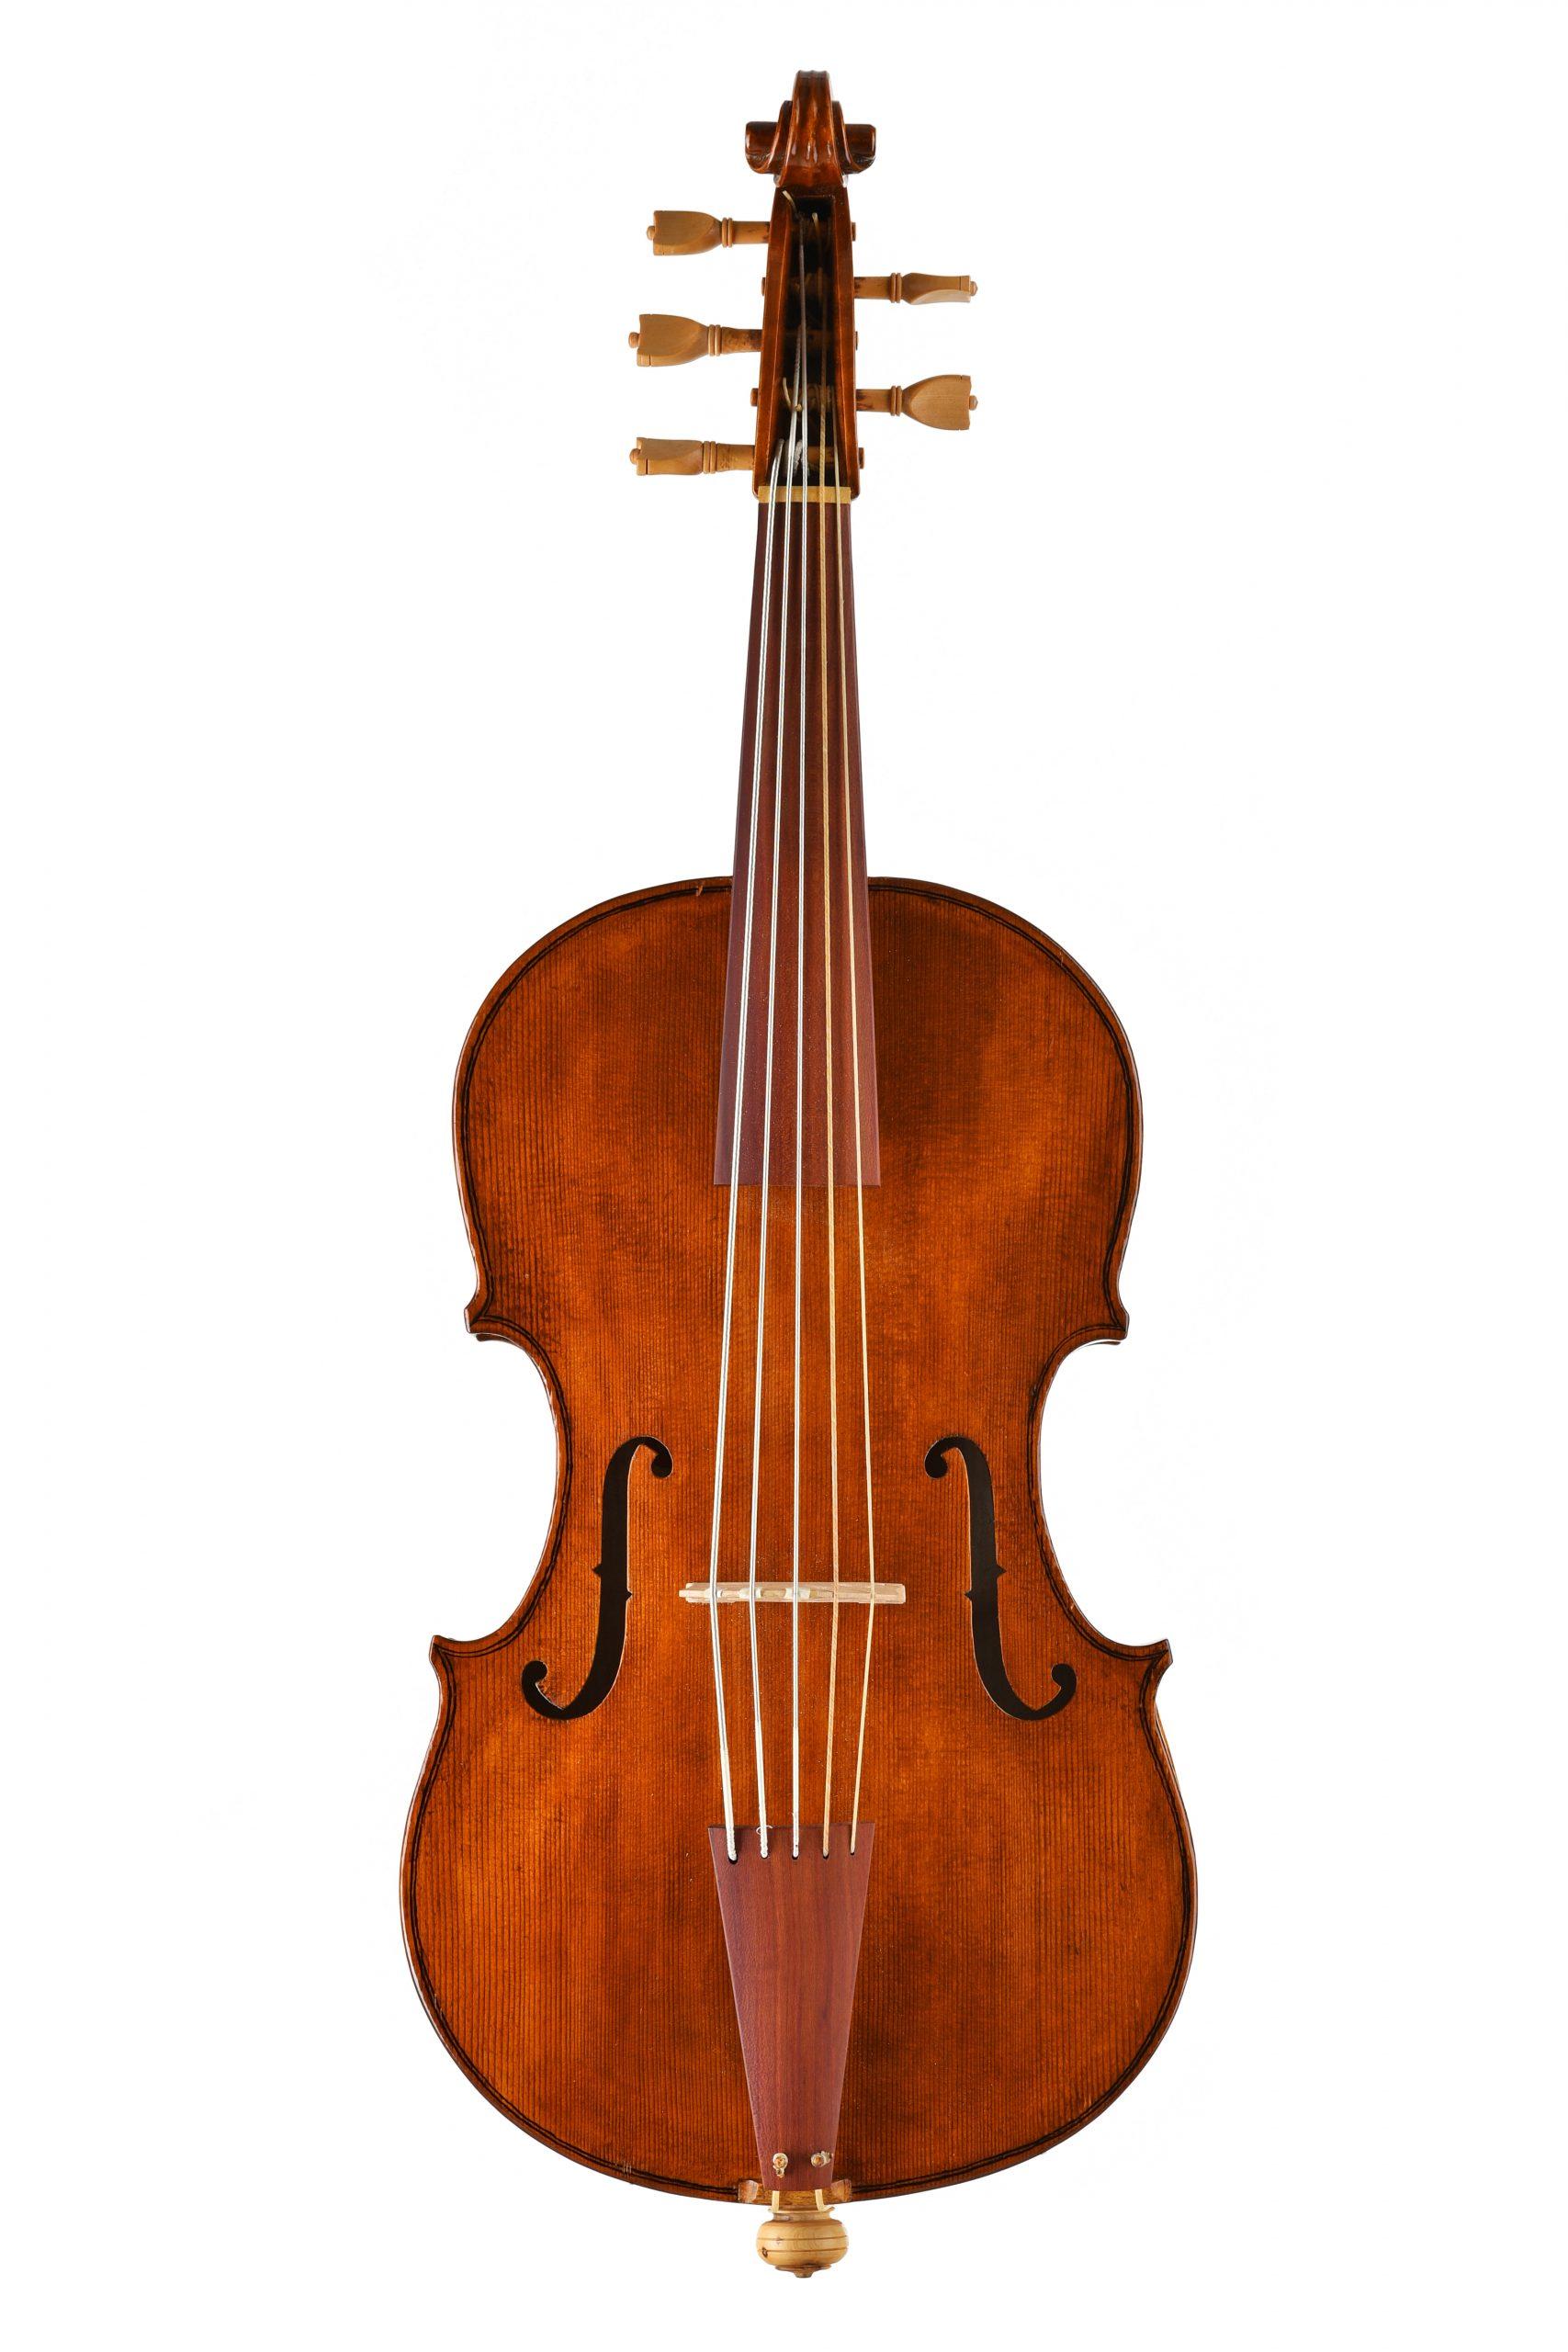 Violoncello da spalla Johann Wagner Borstendorf Daniela Gaidano